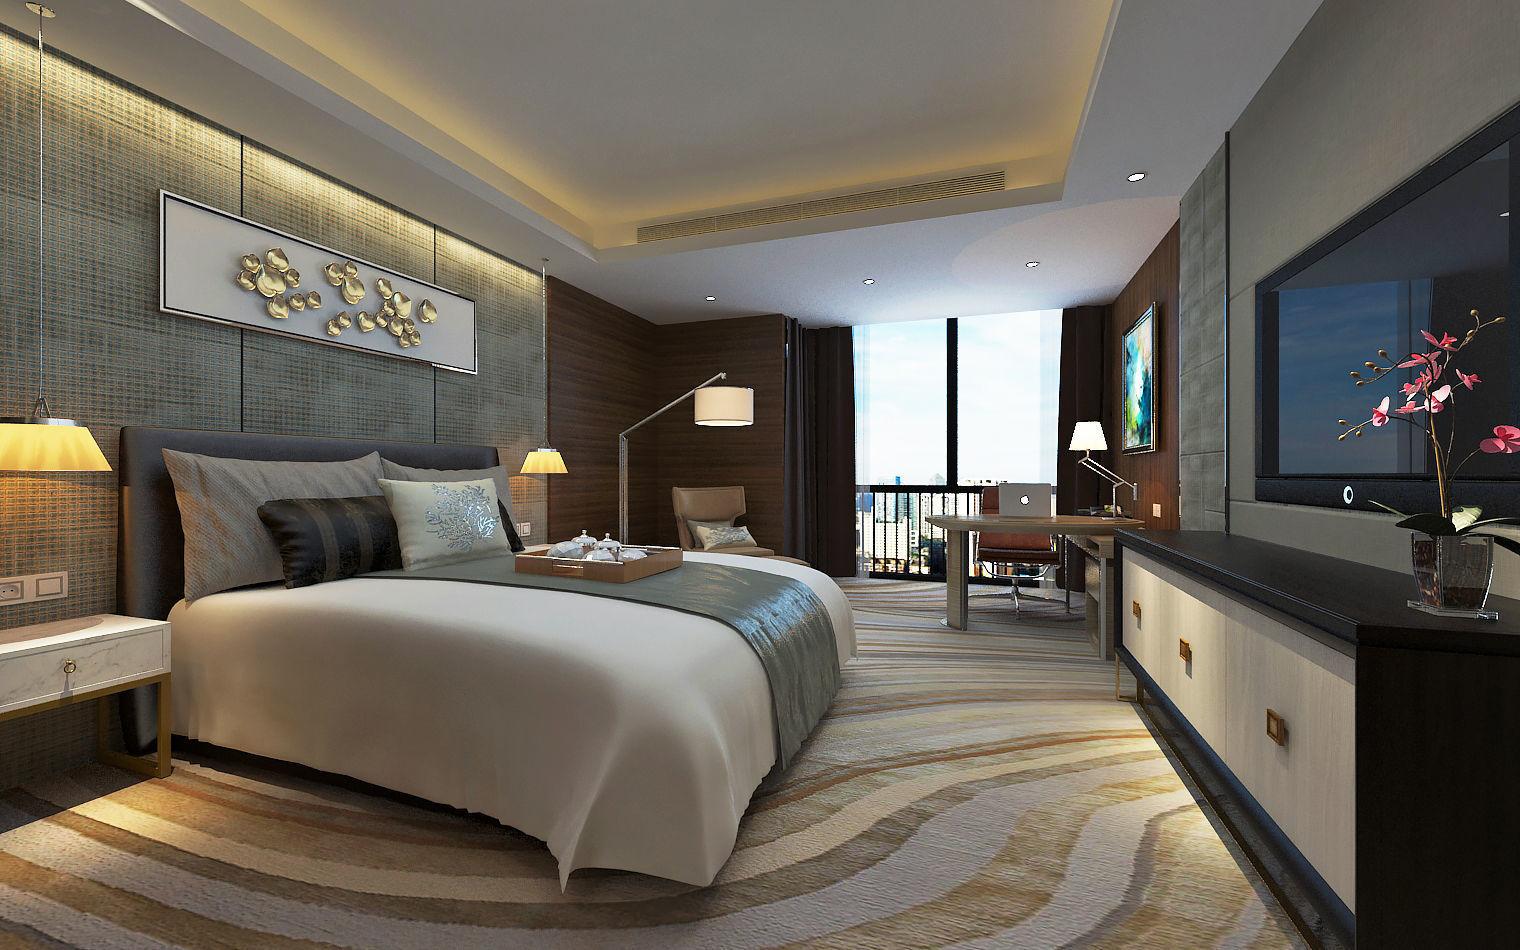 Kumar Hotel - Gudiyatham - Vellore Image